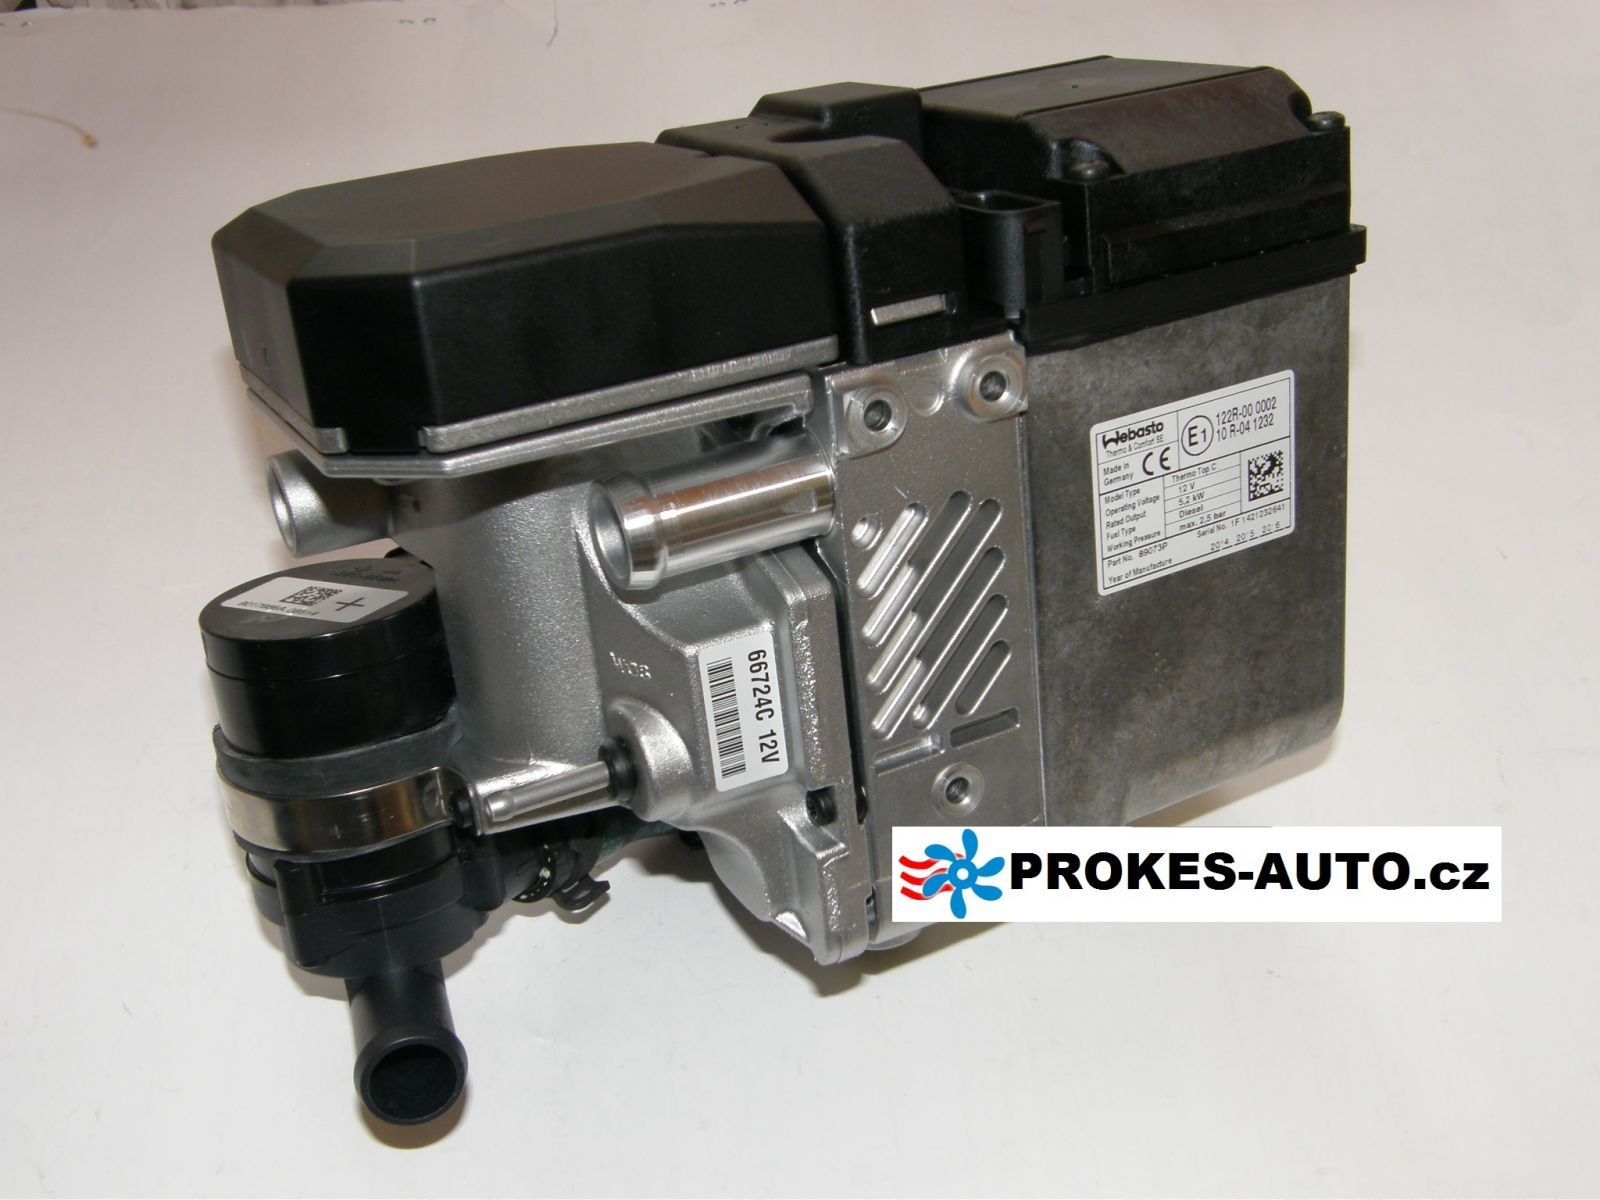 WEBASTO Thermo 50 diesel